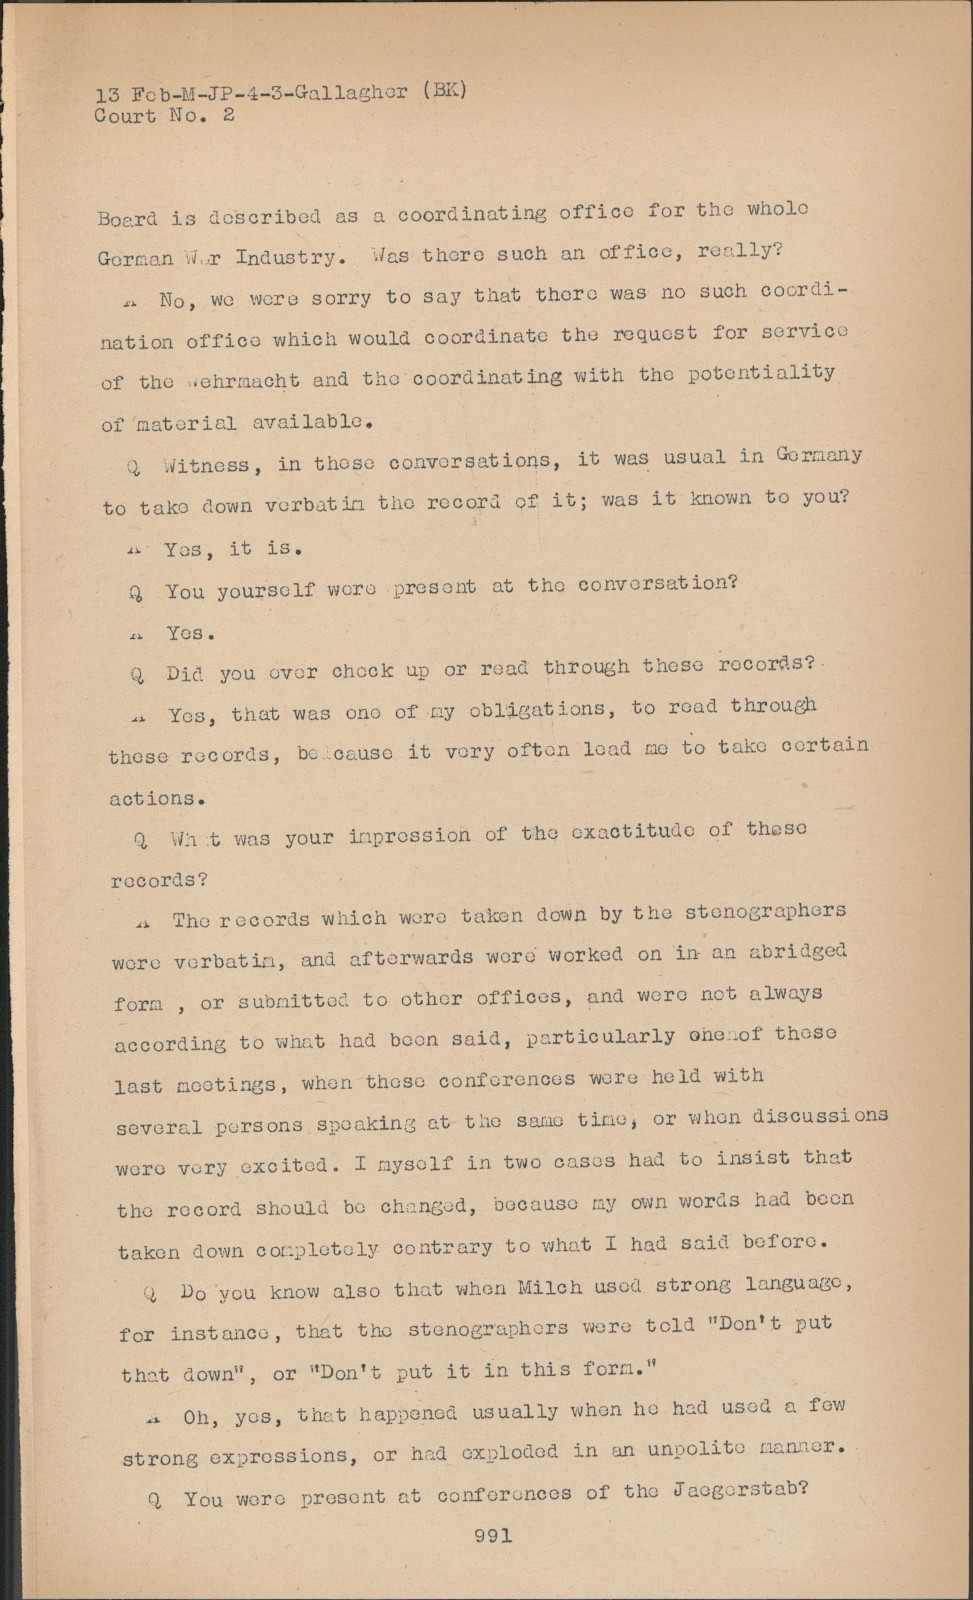 Nuremberg - Transcript Viewer - Transcript for NMT 2: Milch Case